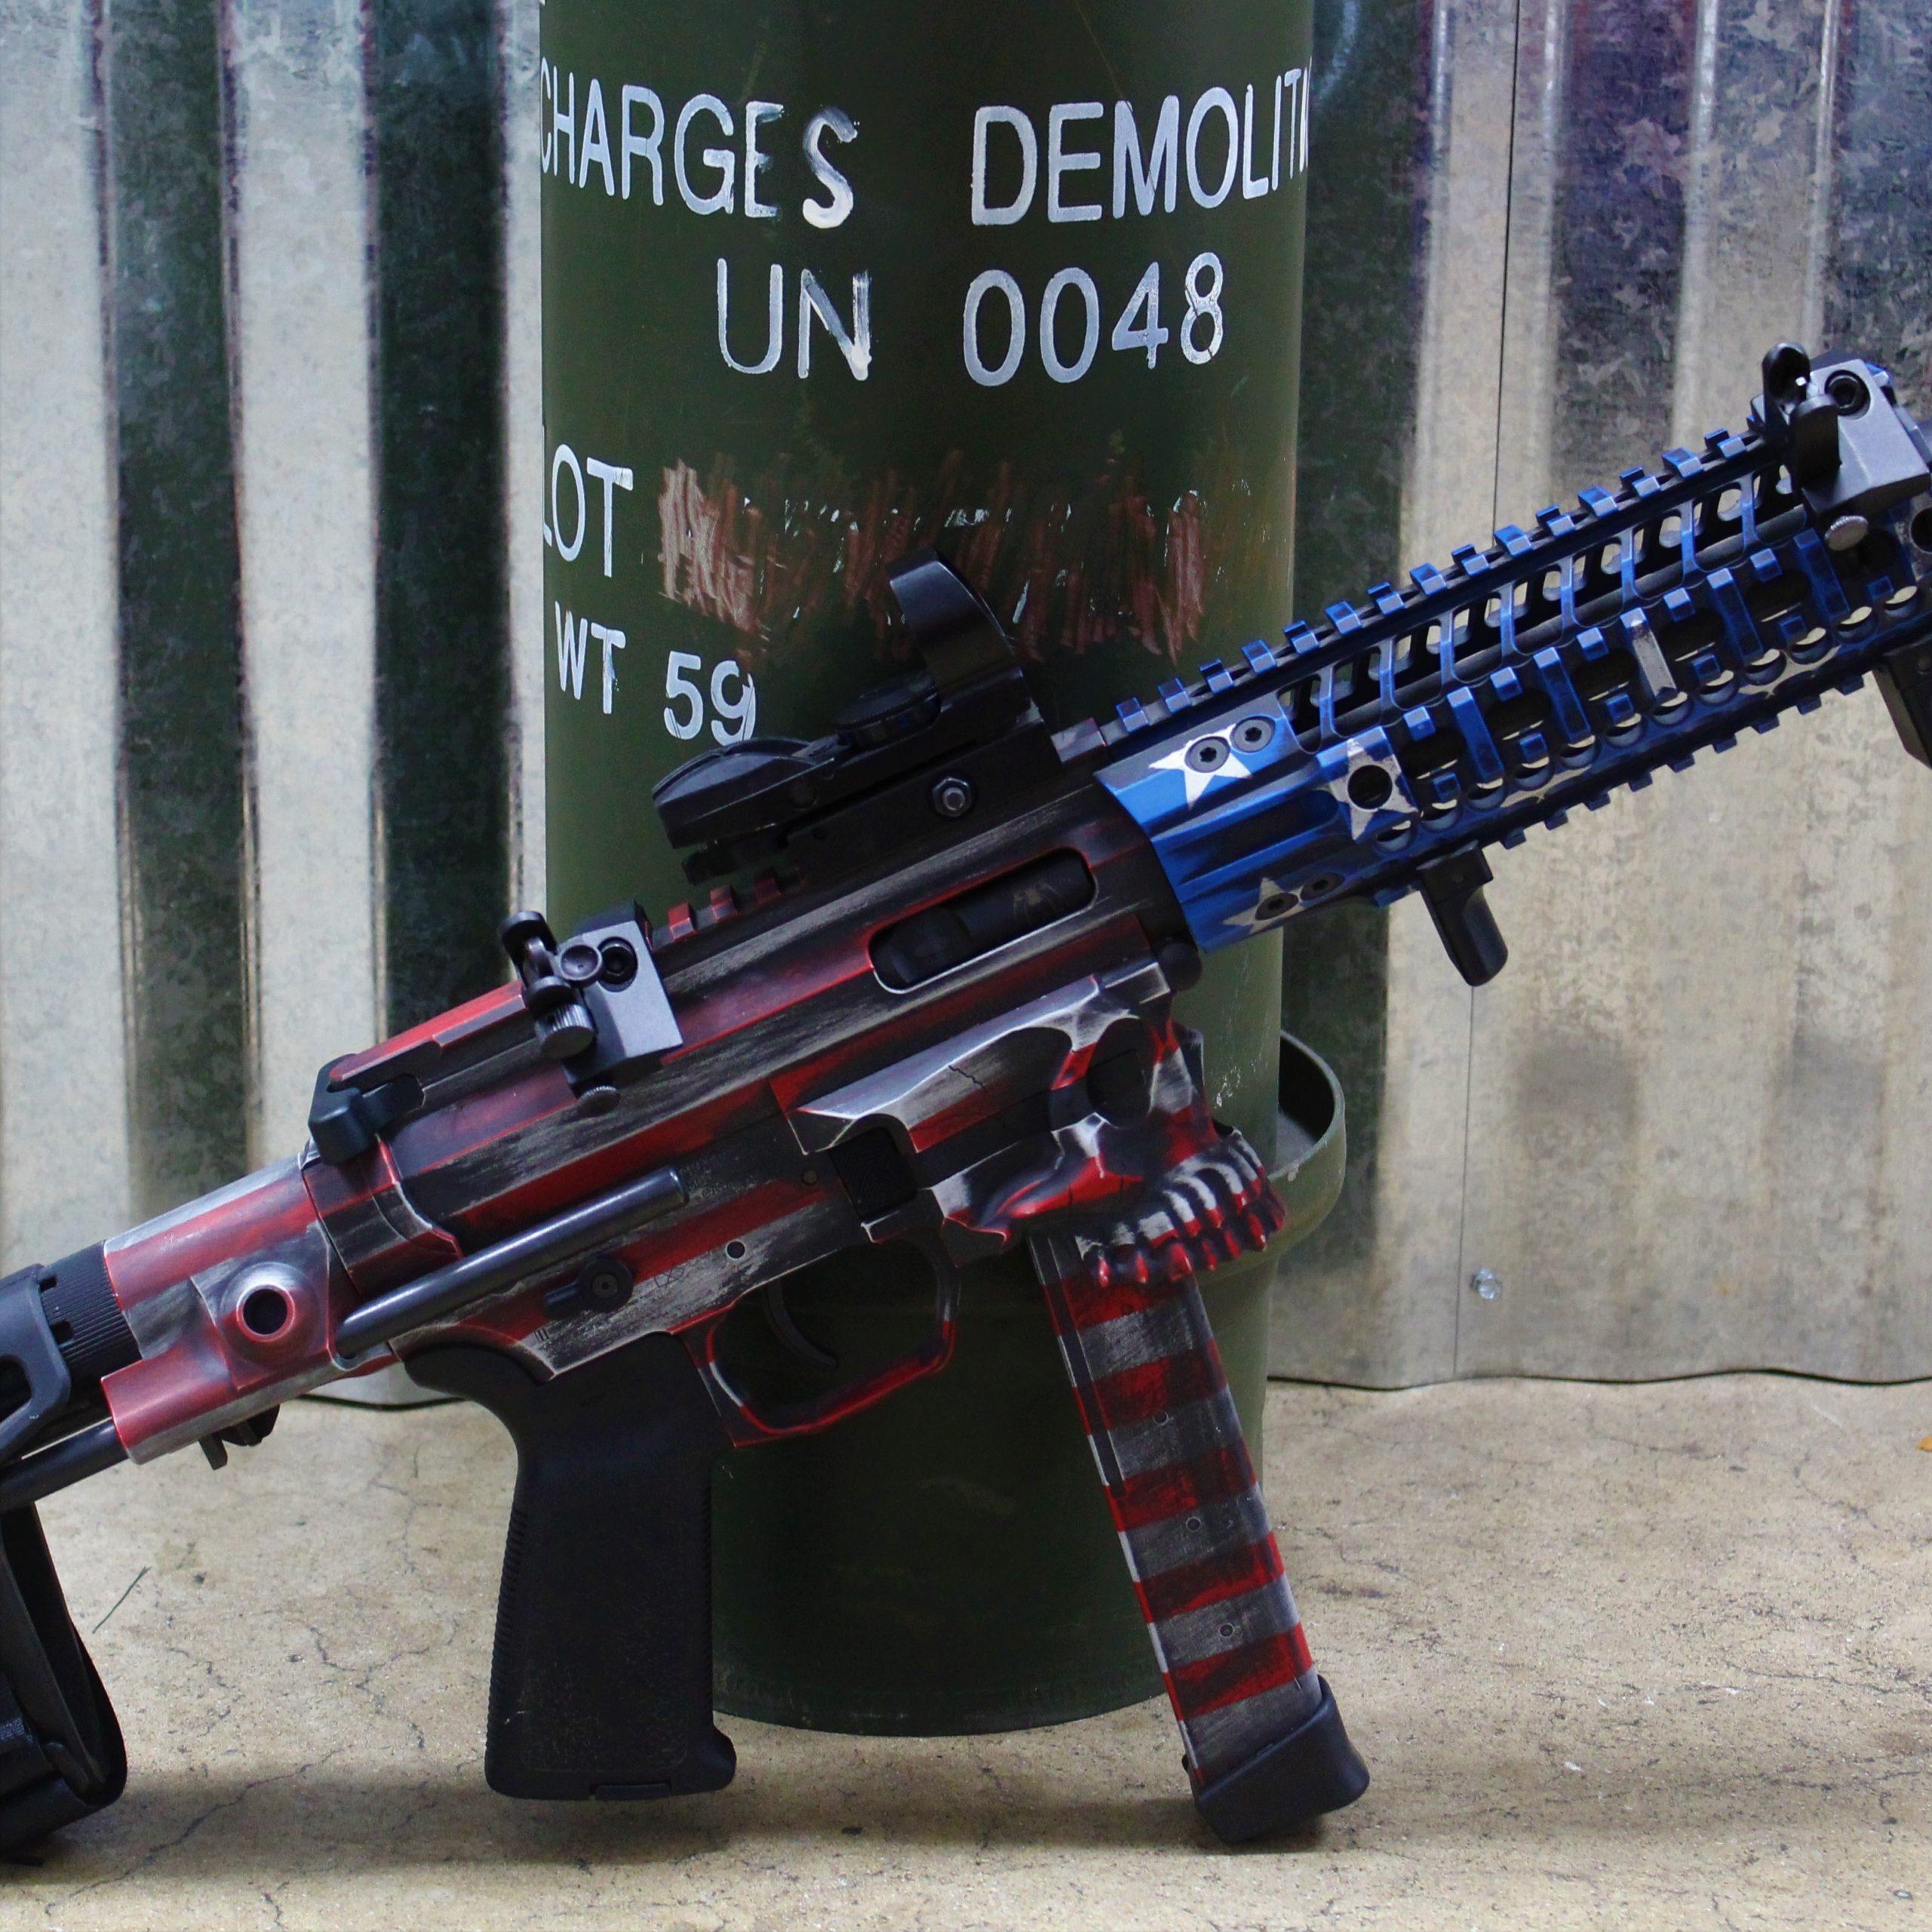 Decorative AR pistol